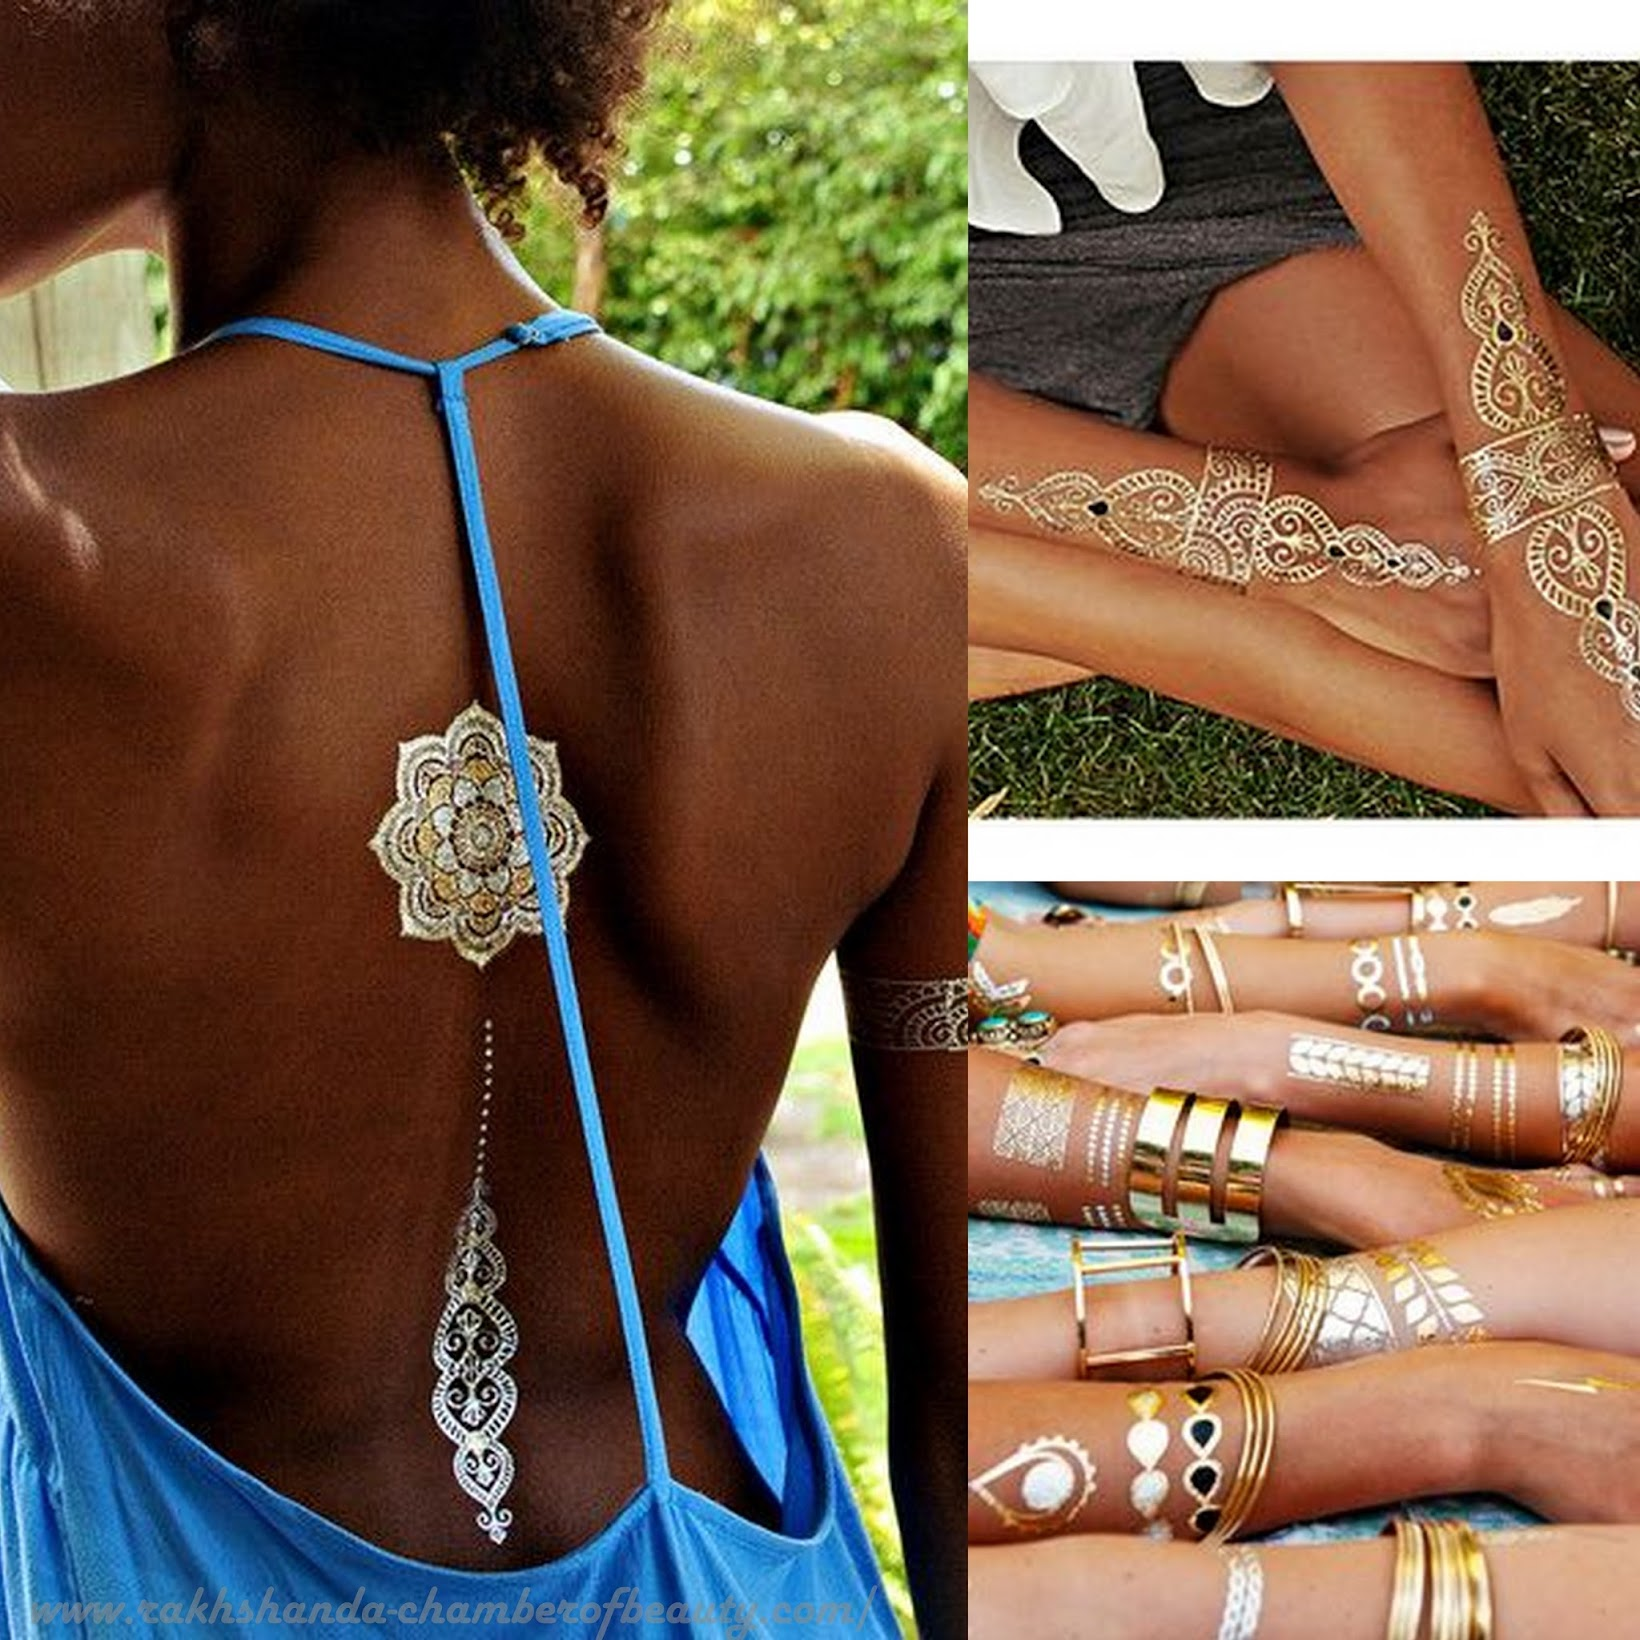 Fashion trends 2015- Metallic Flash tattoos | Stylemoi Giveaway, How to wear Metallic Flash tattoos, Style tips, Indian Fashion blogger, Chamber of Beauty